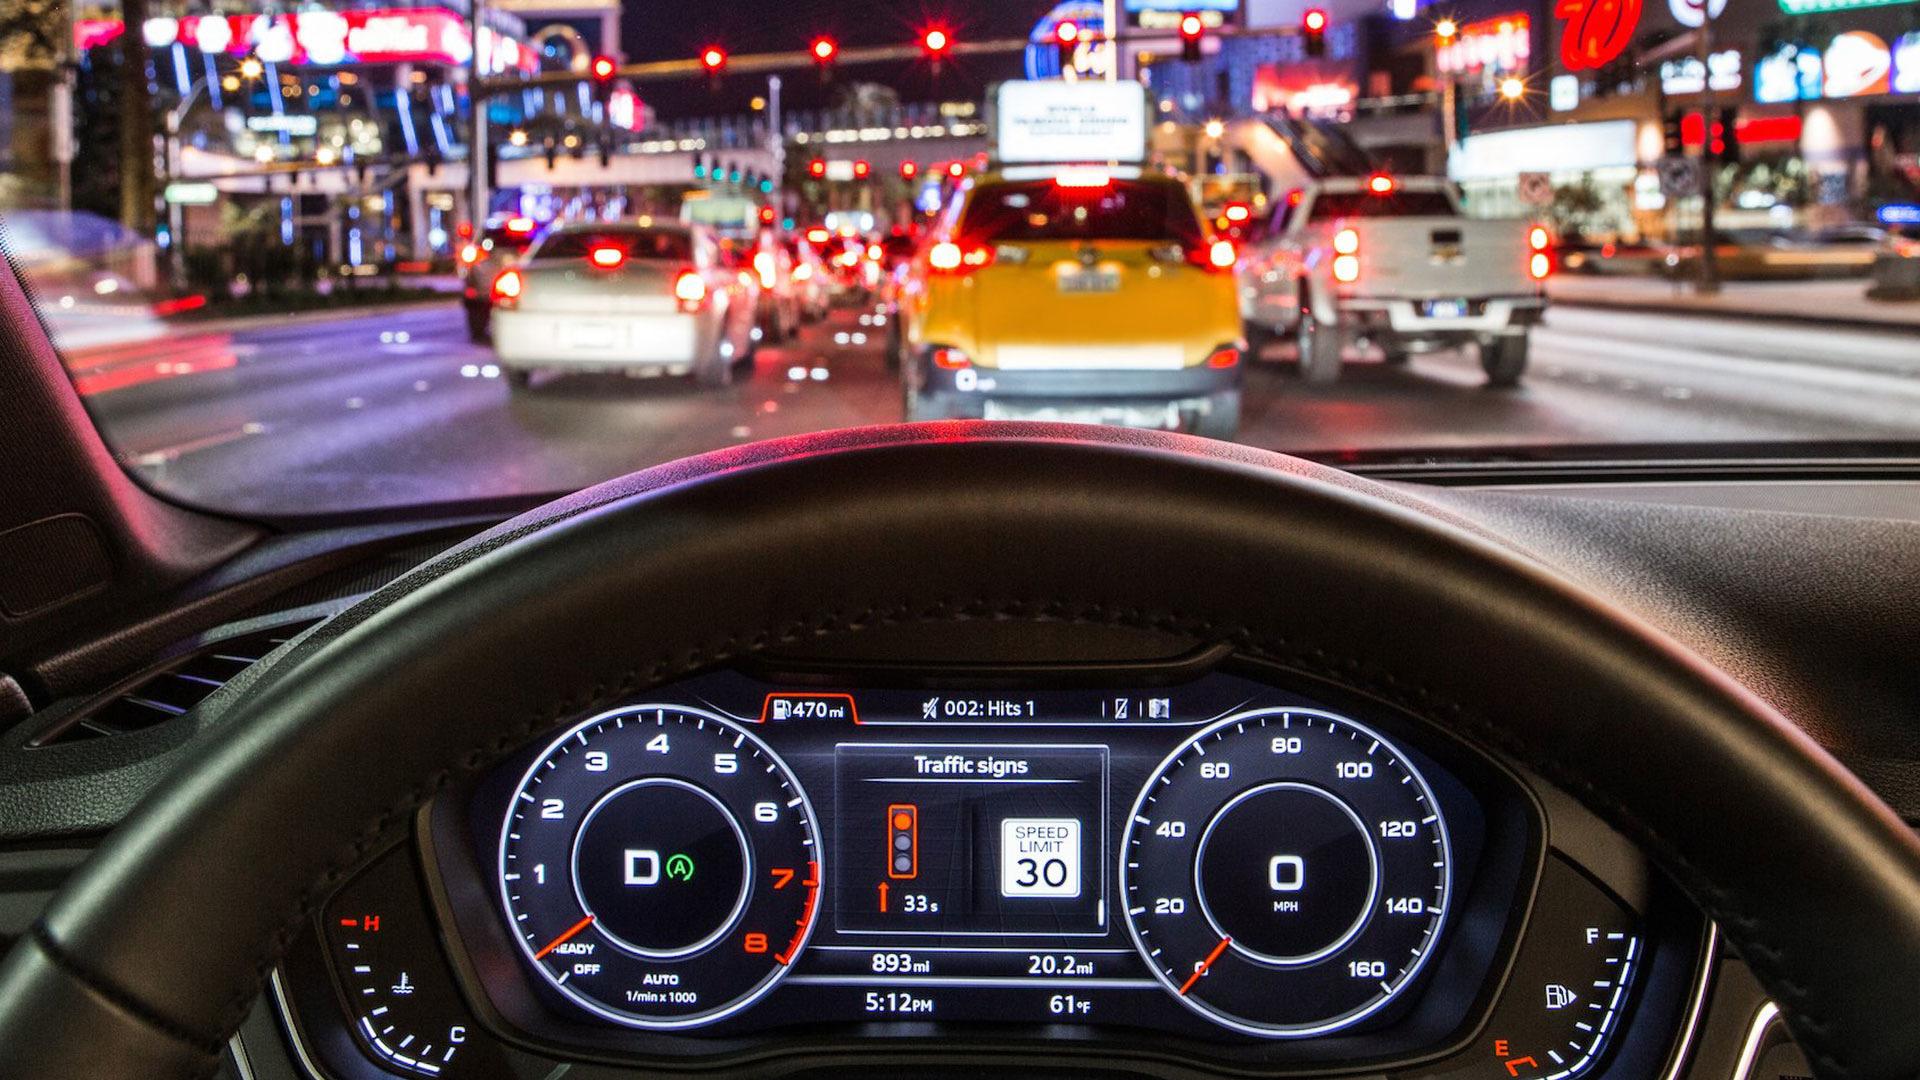 audi-traffic-light-information-display (2)